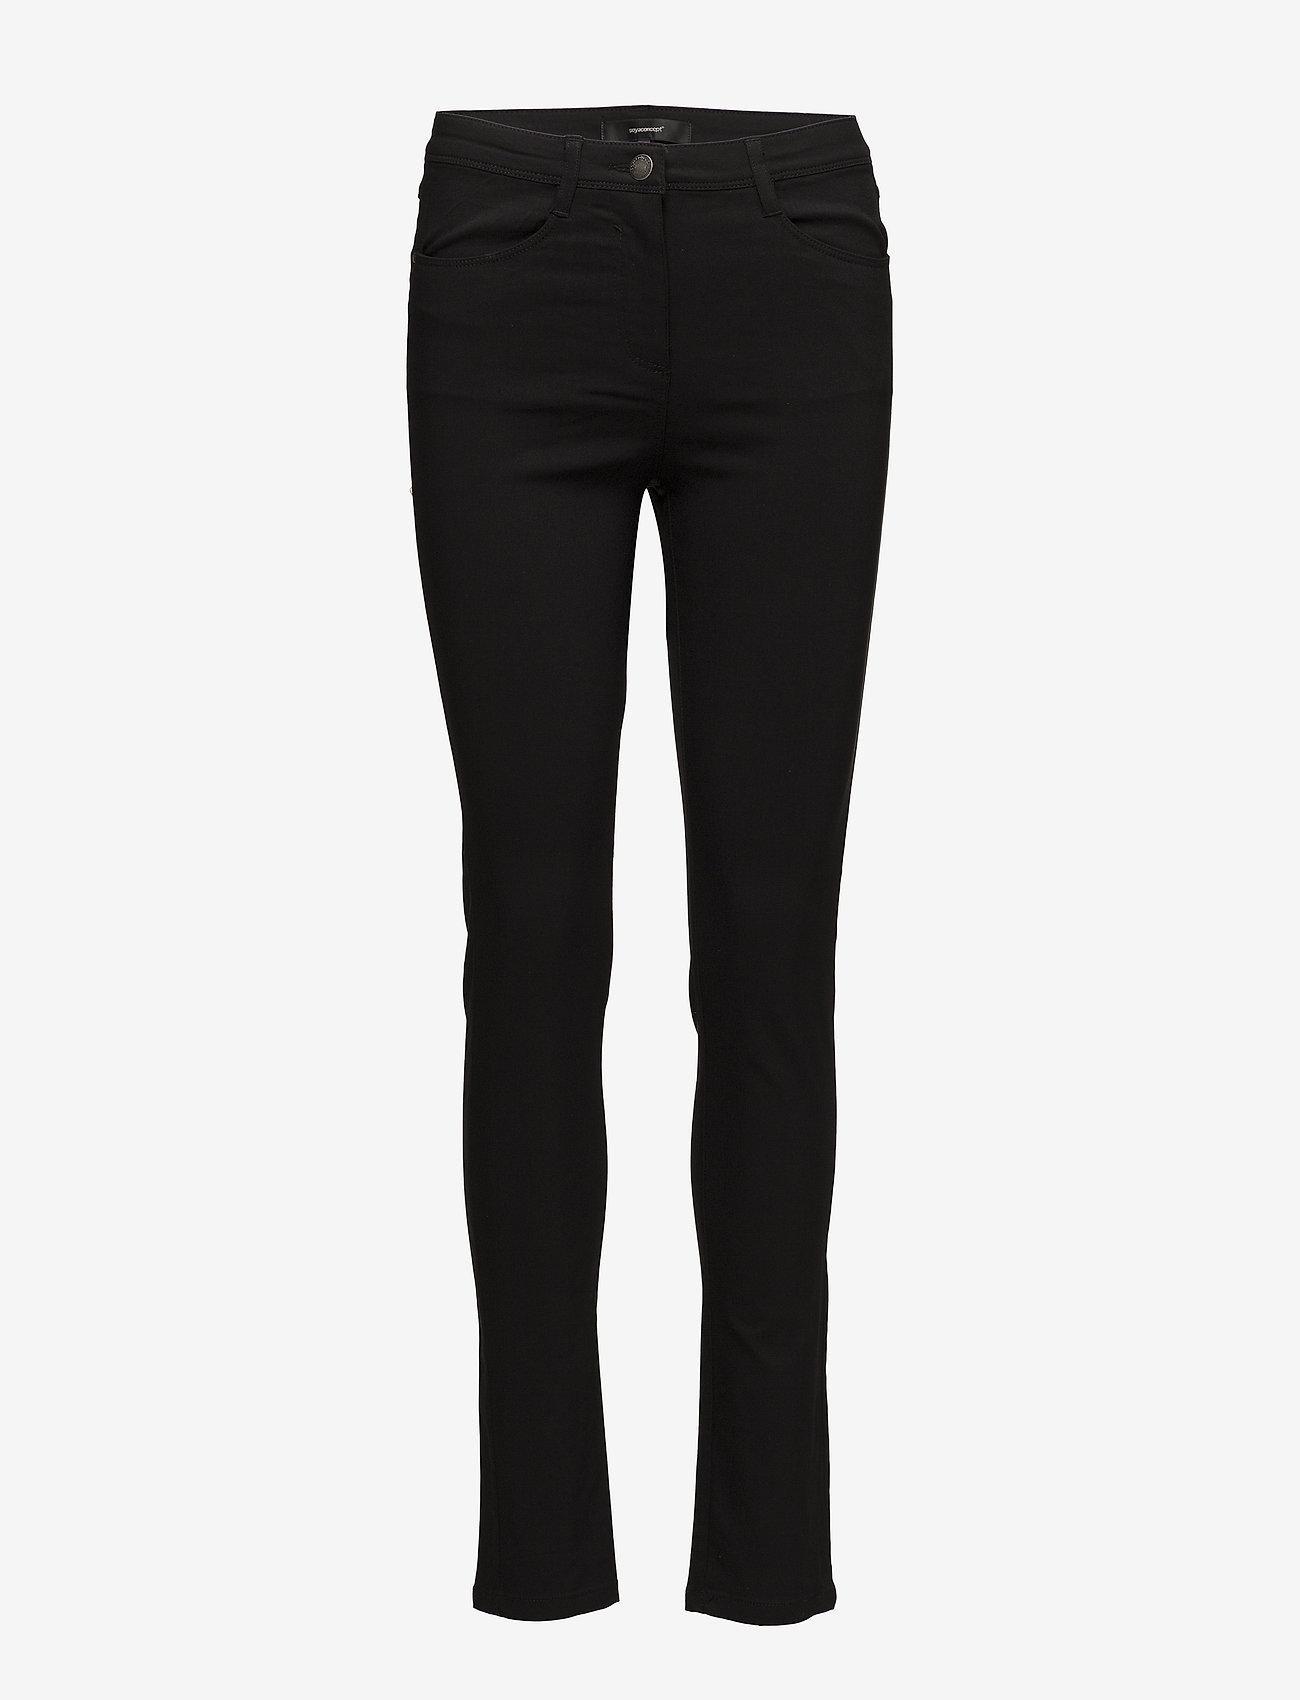 Soyaconcept - SC-LILLY - slim jeans - black - 0